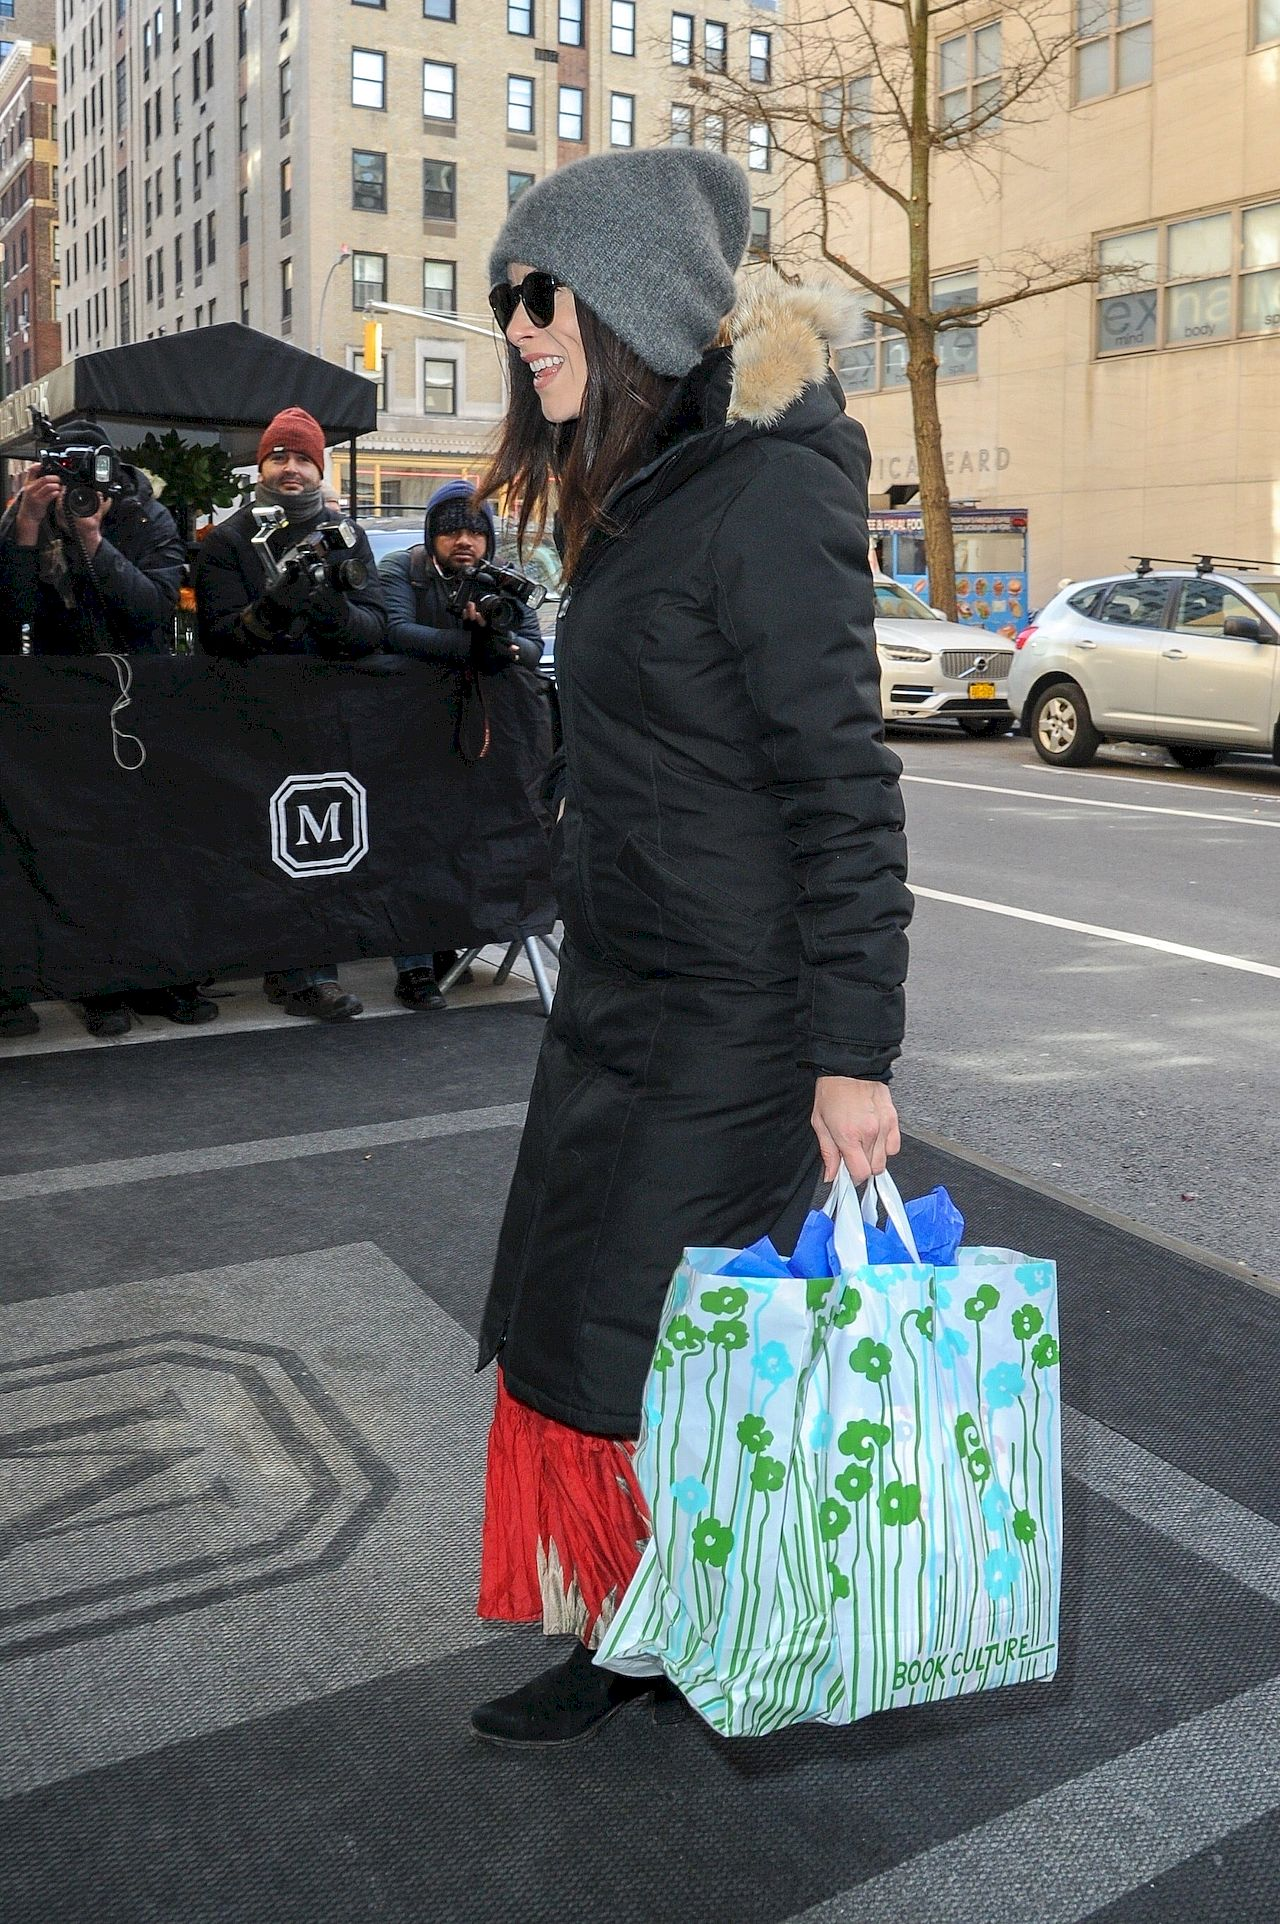 'Suits' star Abigail Spencer arrives for Meghan Markle's baby shower Abigail Spencer